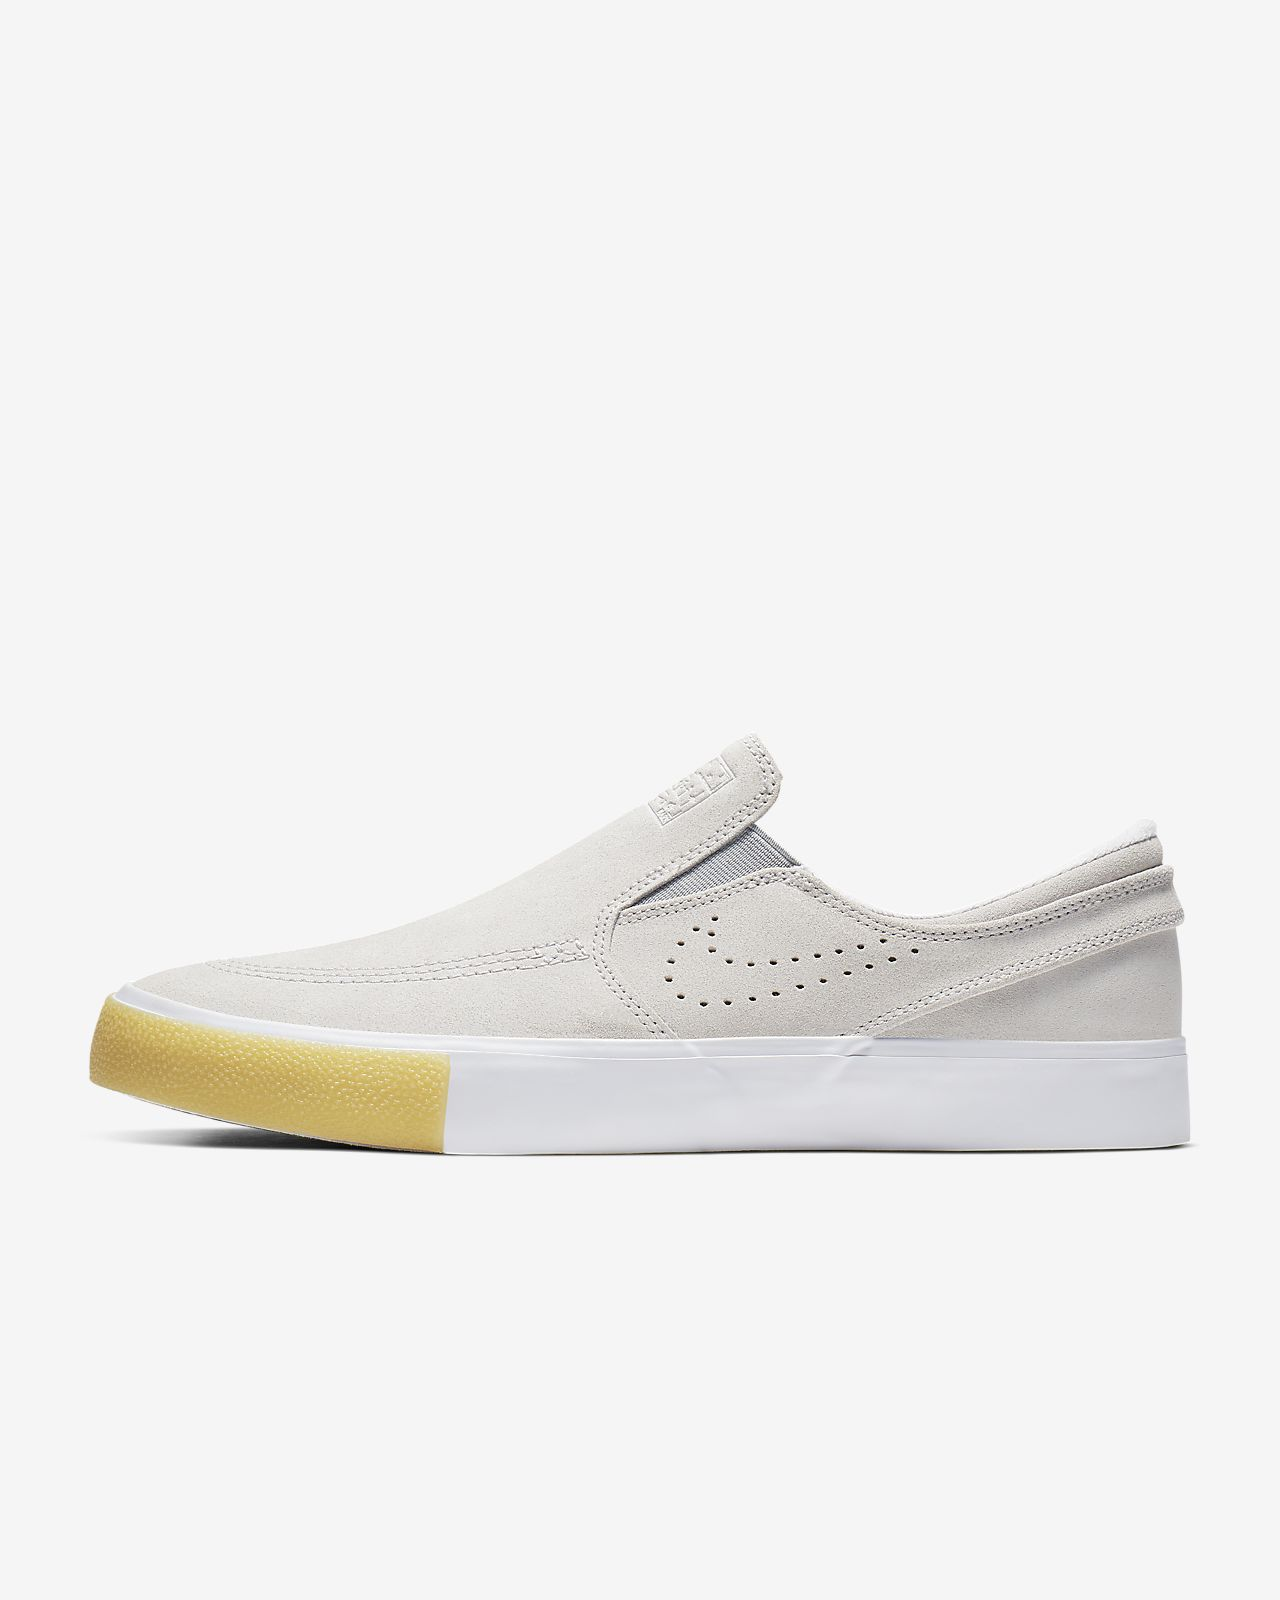 d5c5450bd5 Nike SB Zoom Stefan Janoski Slip RM SE Skate Shoe